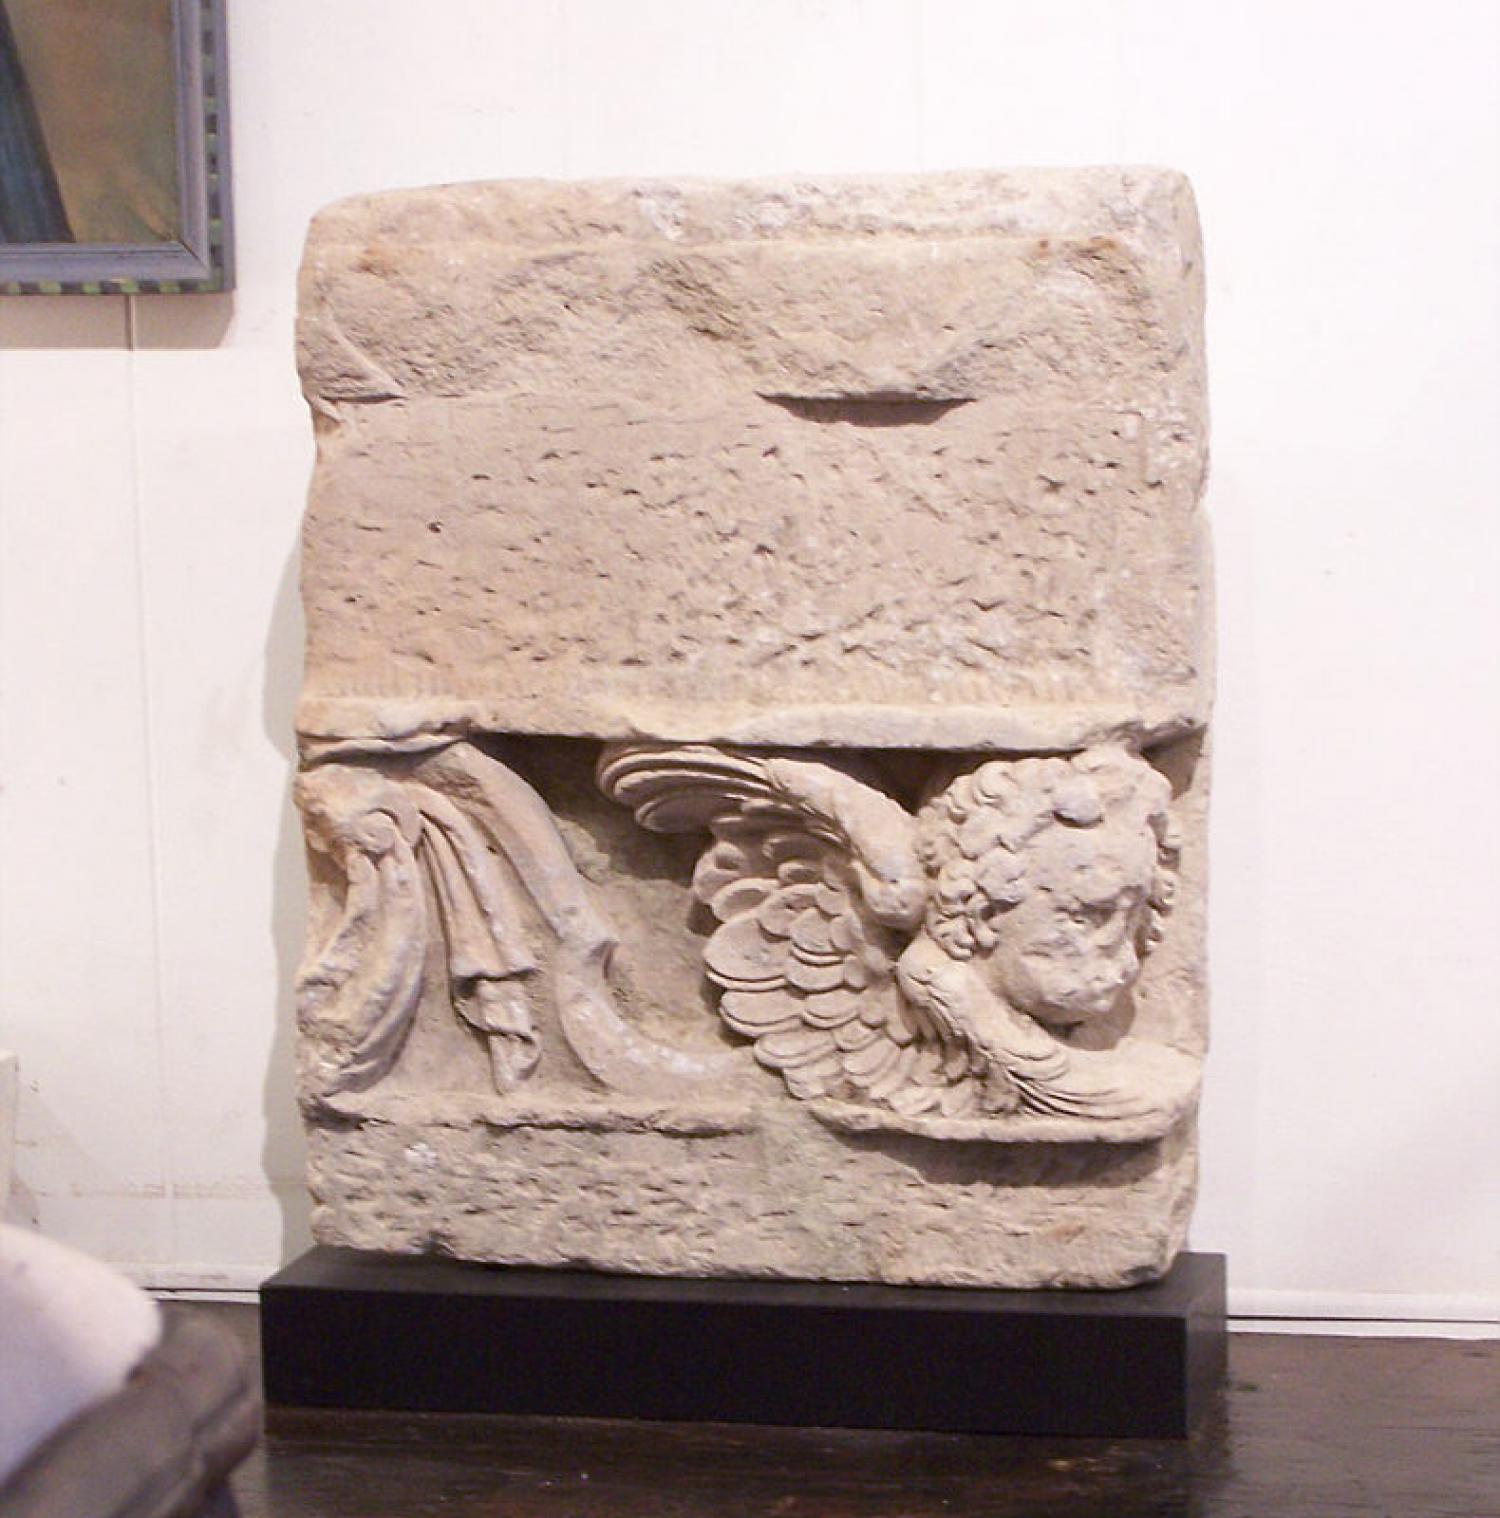 17th century Italian limestone carving of an angle